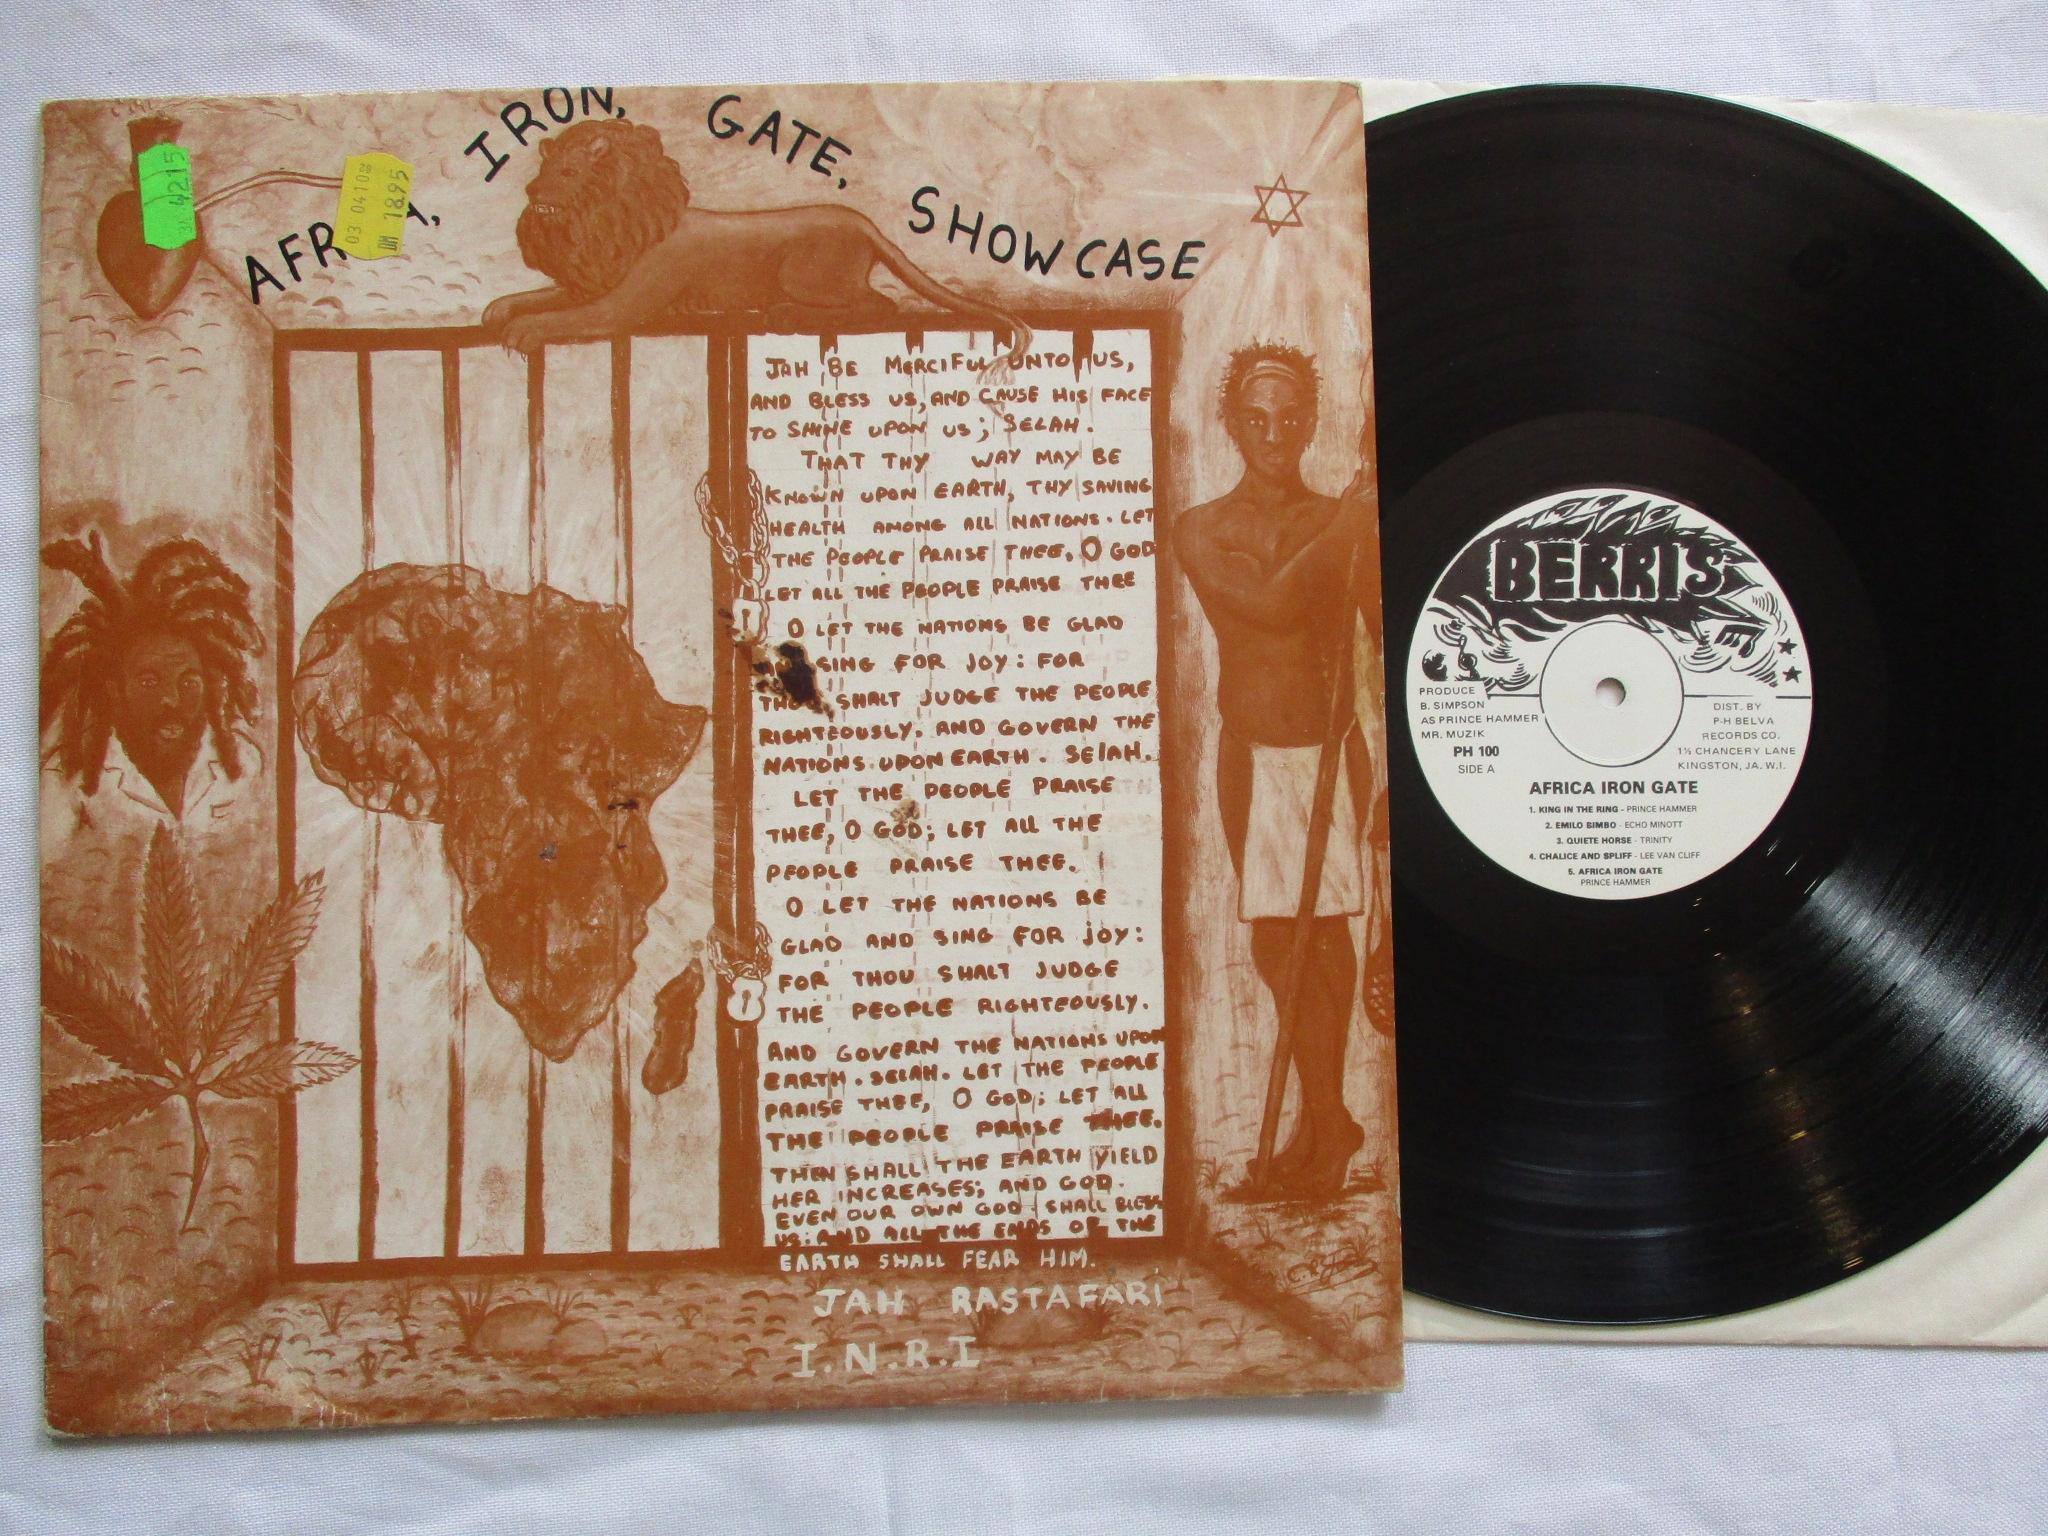 Africa Iron Gate Showcase #2760